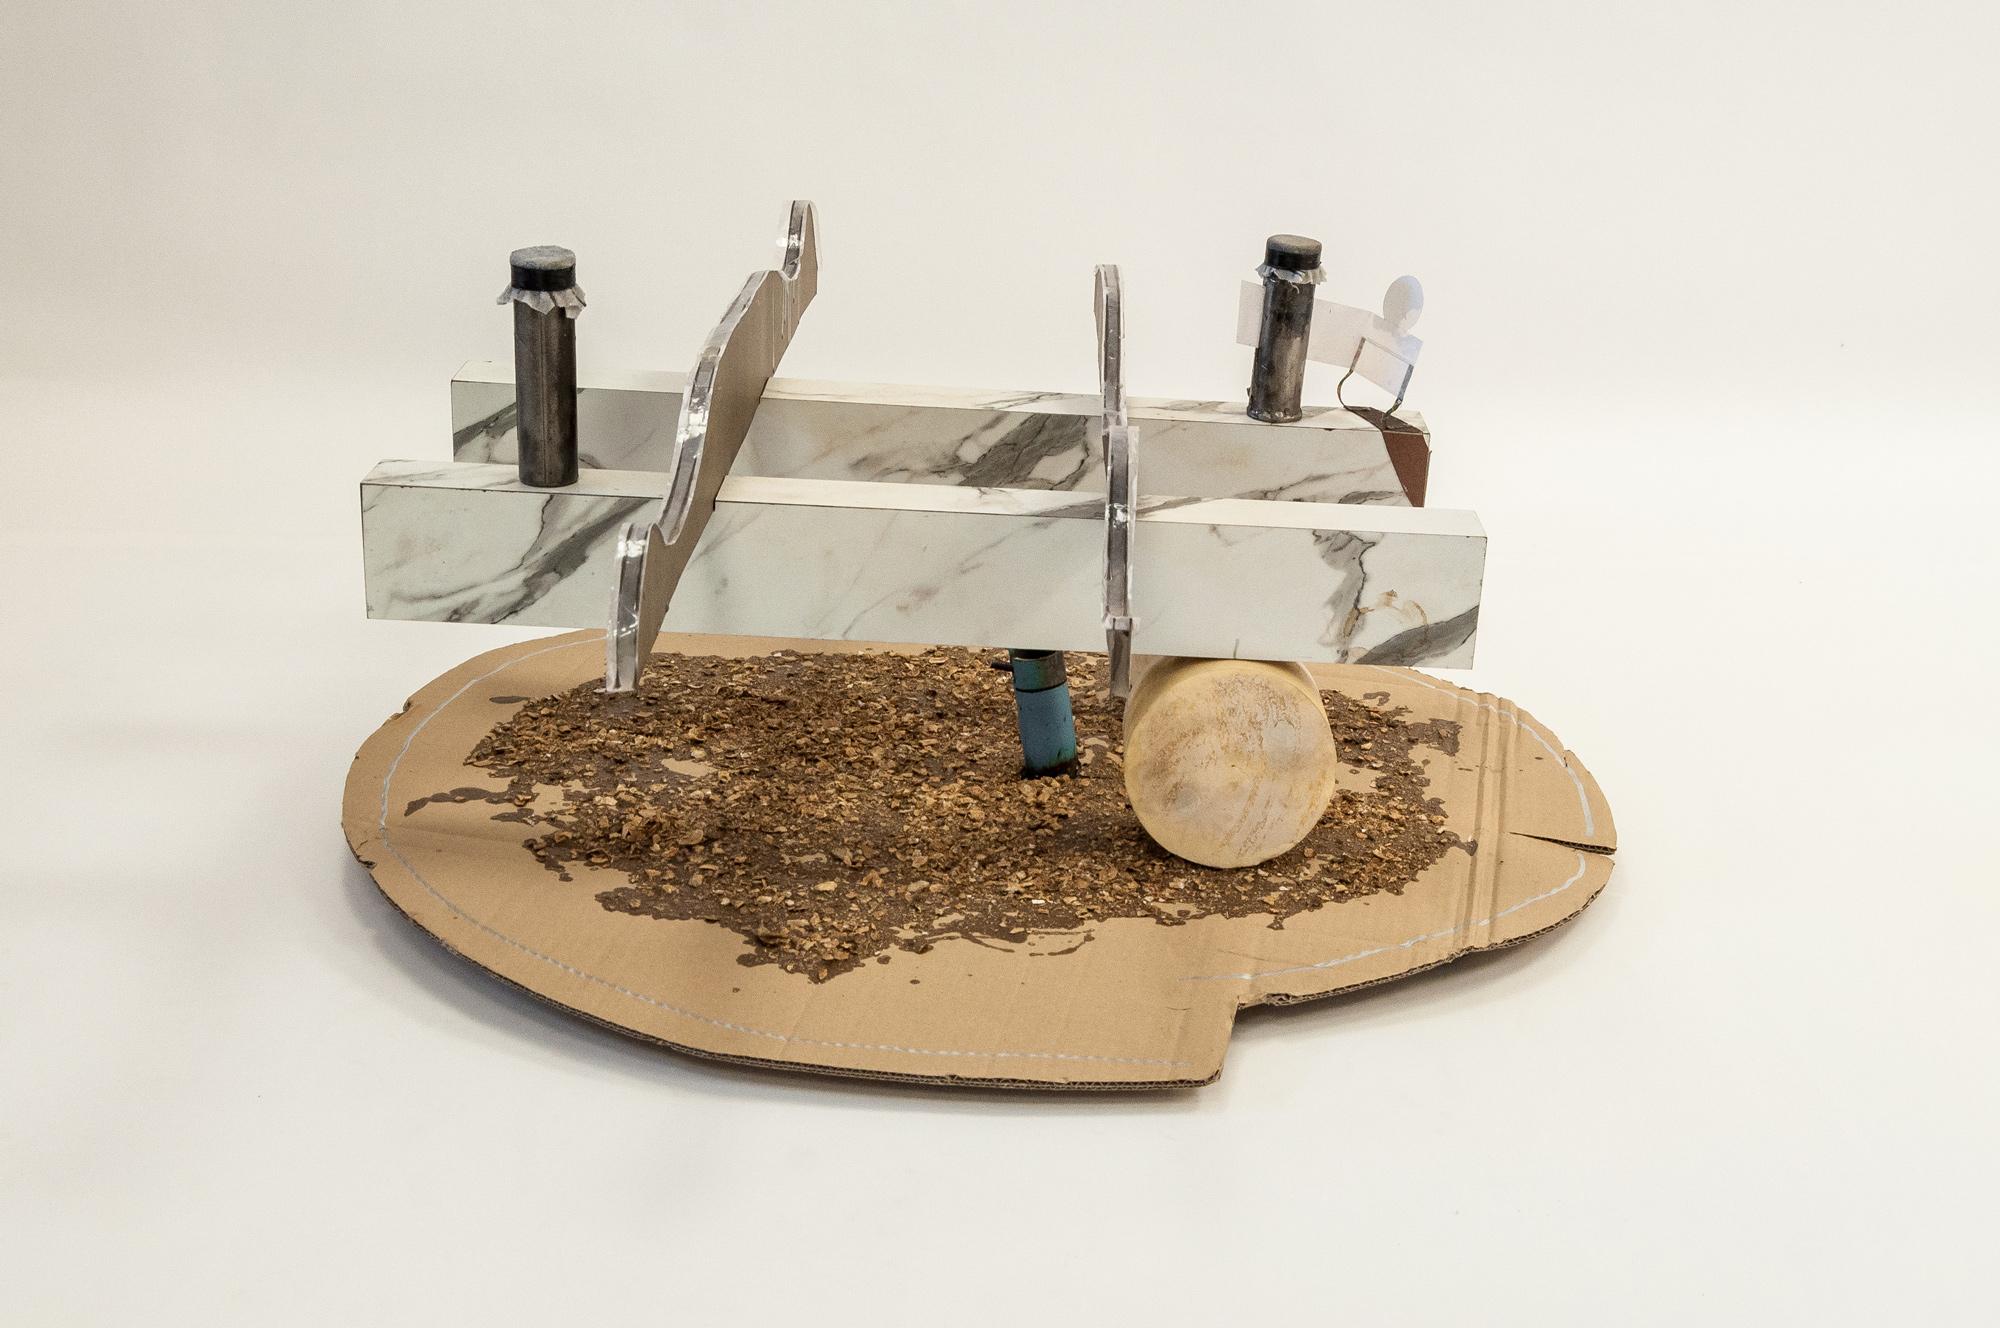 3 │ metal, wood, plastic, cardboard, paper, fabric │ 2020 │ 37cm x 80cm x 80cm